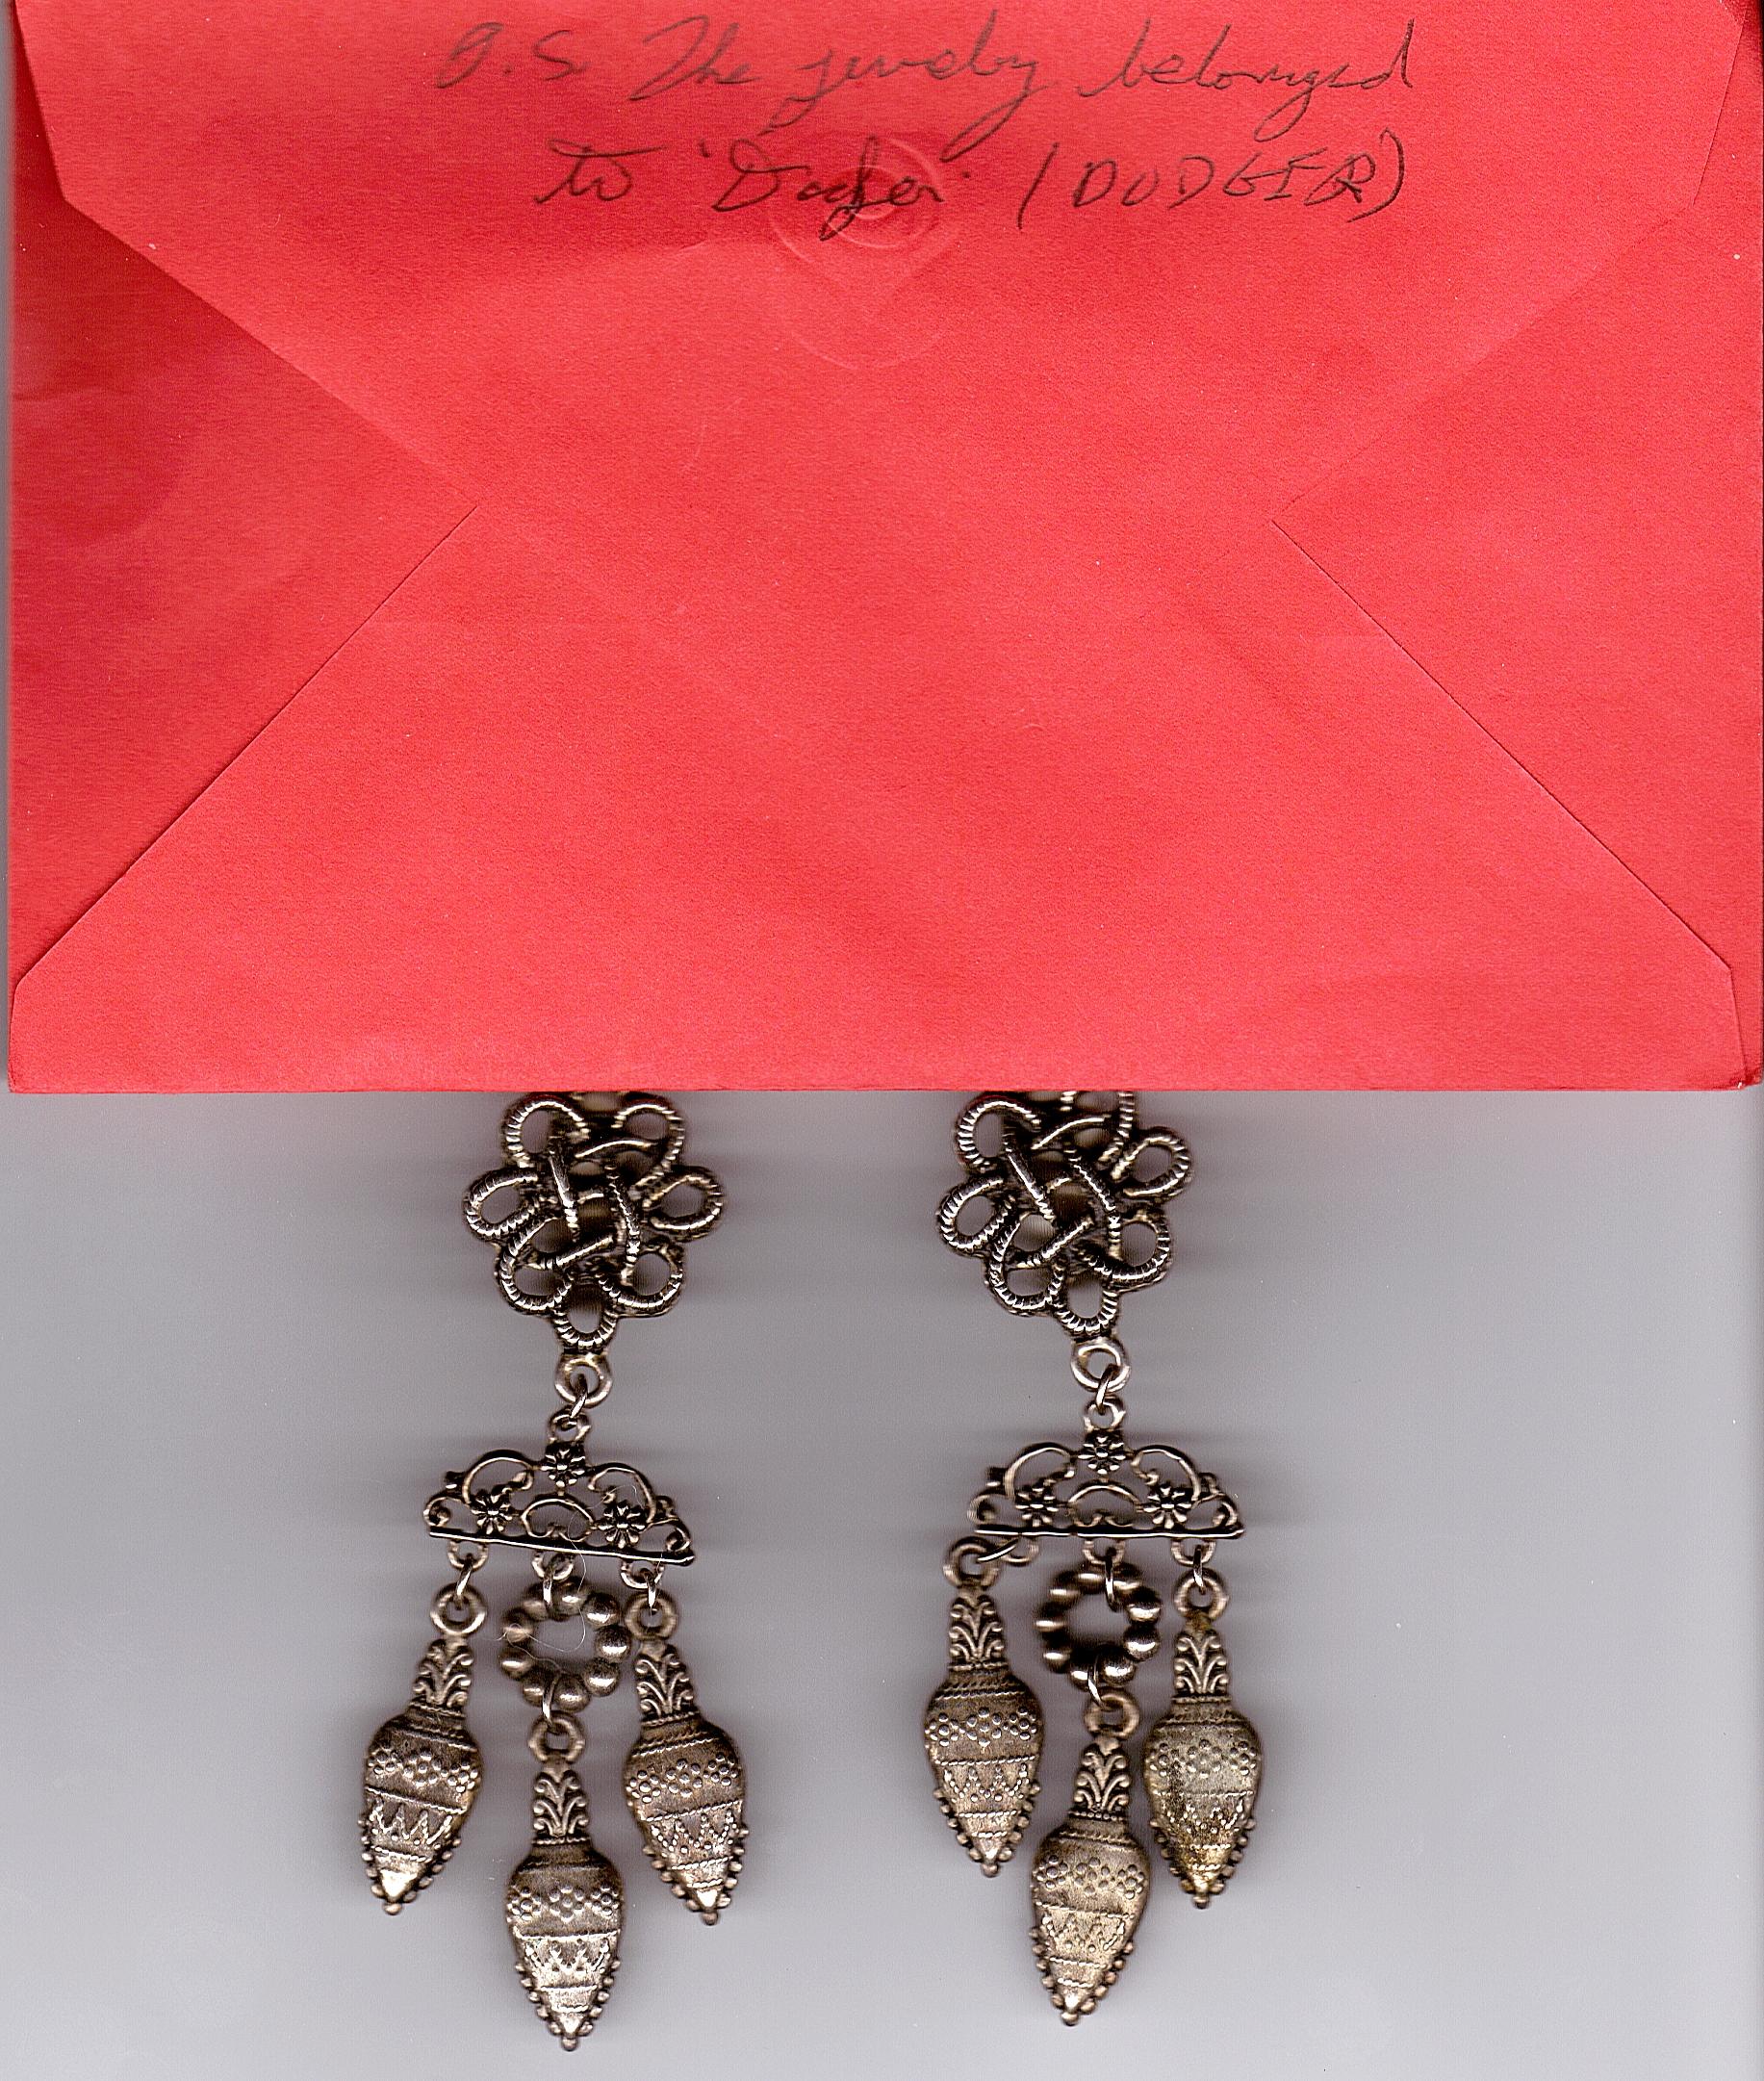 Jesse's jewelry from Dodger